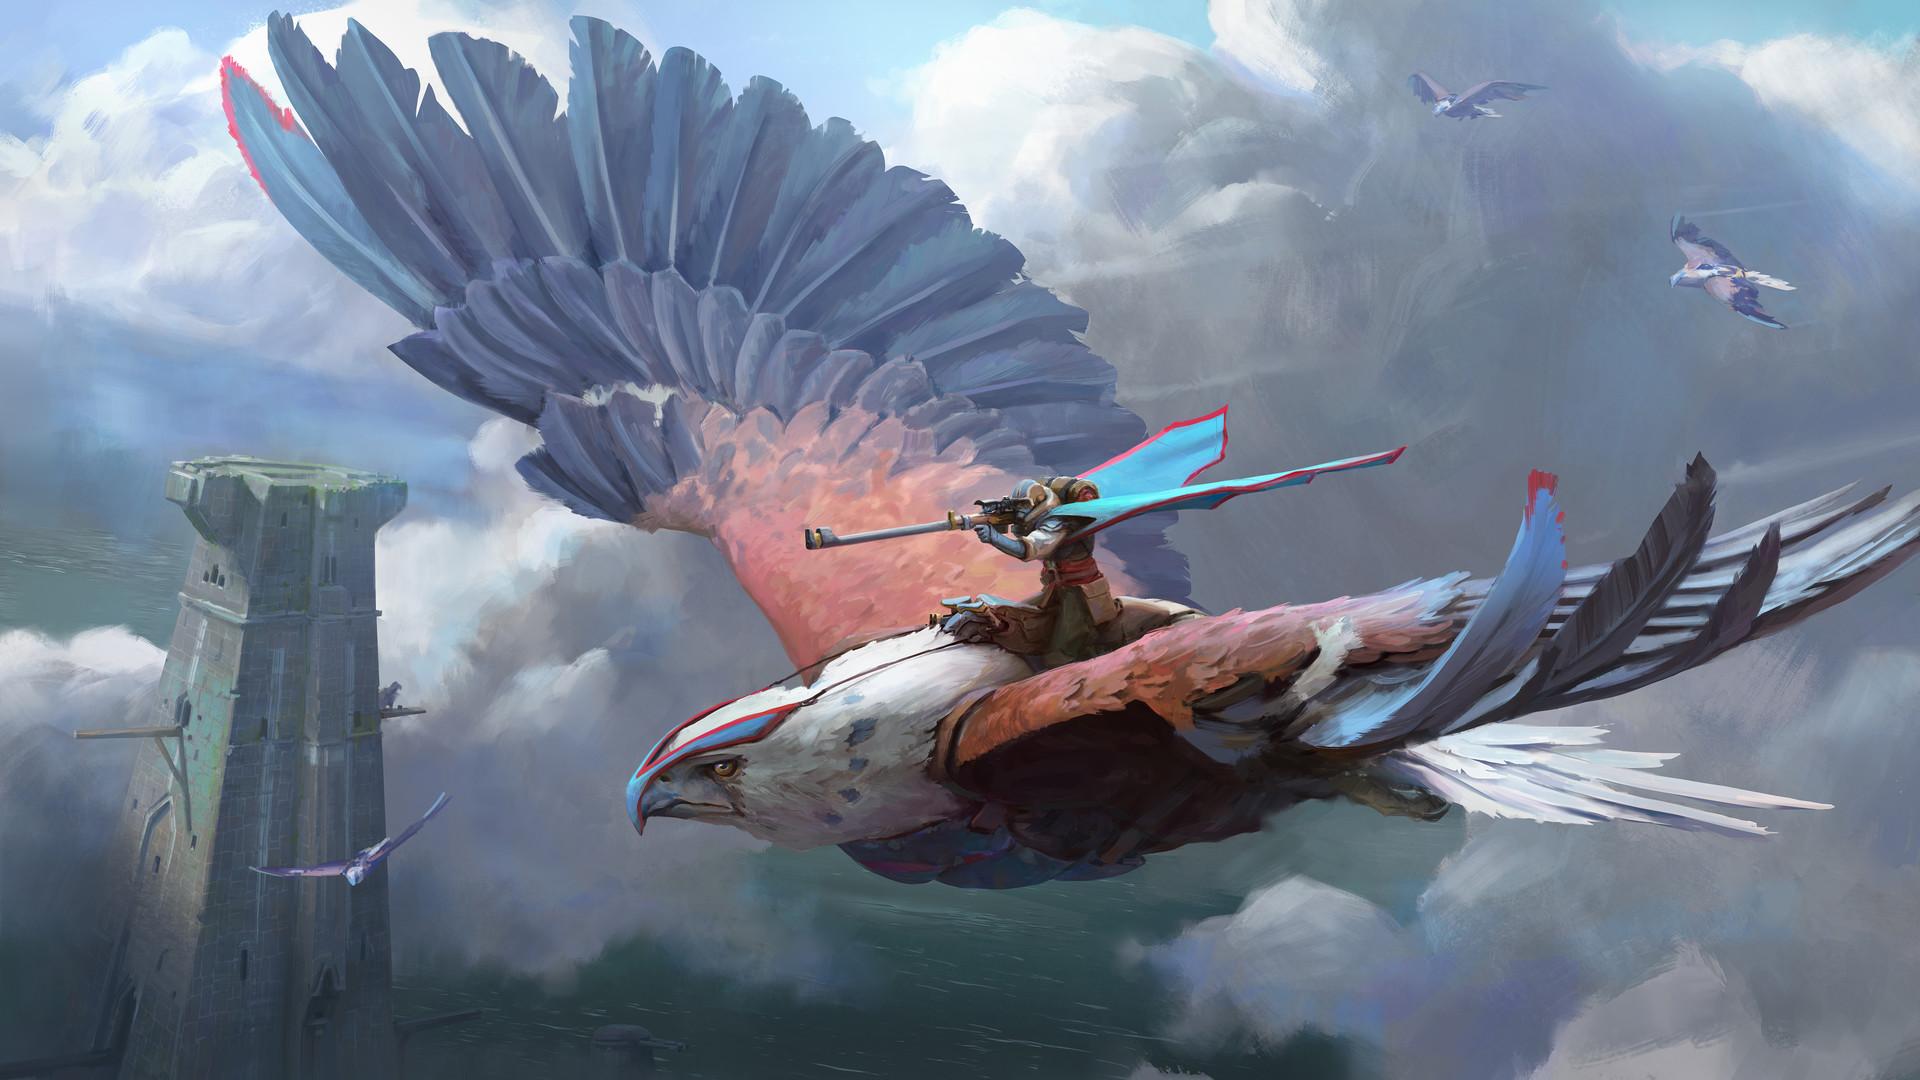 Fantasy Bird 1920x1080